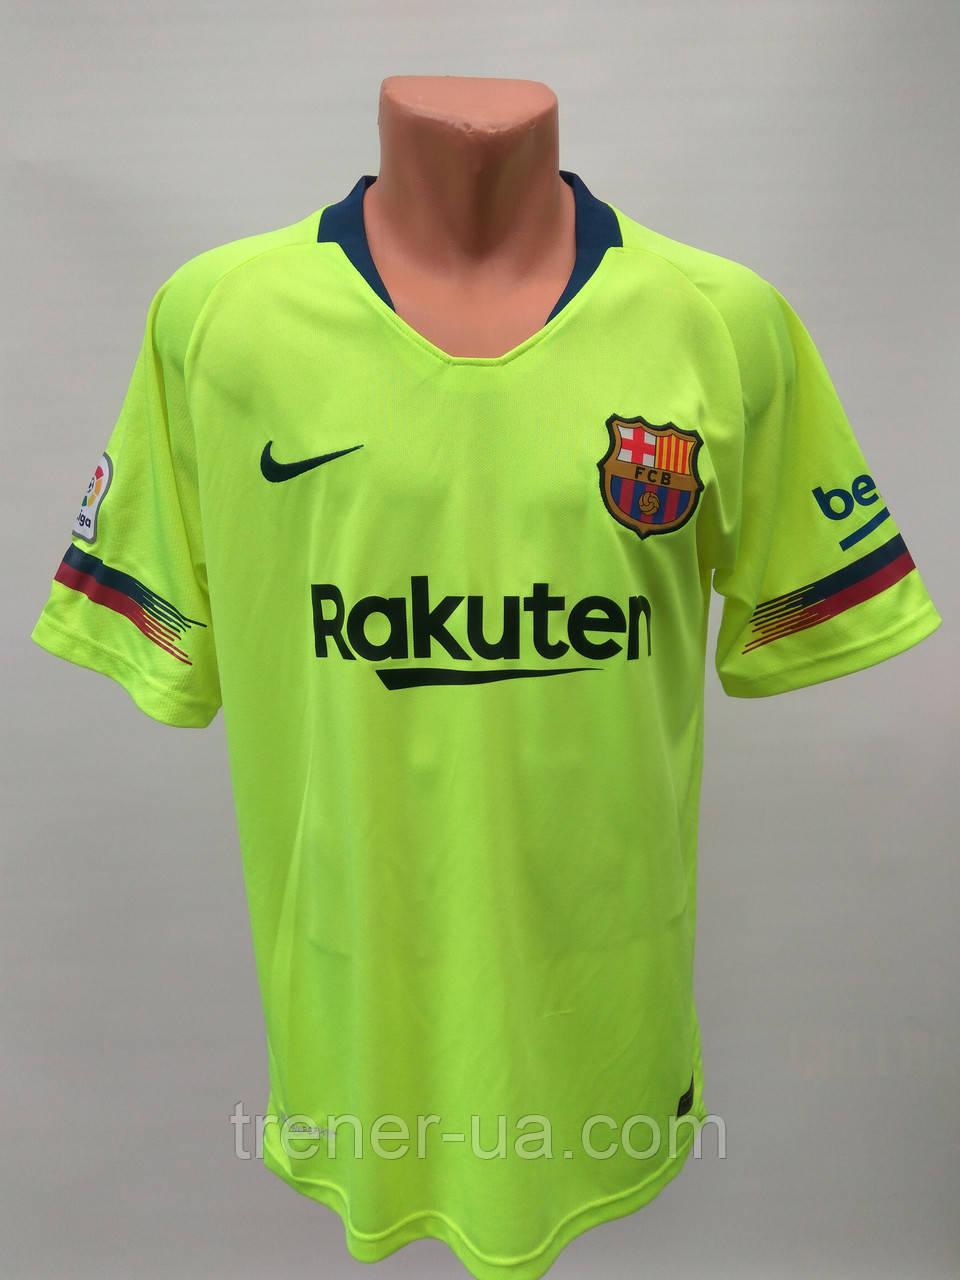 Форма в стилі Nike доросла Barcelona лимон сезон 2019